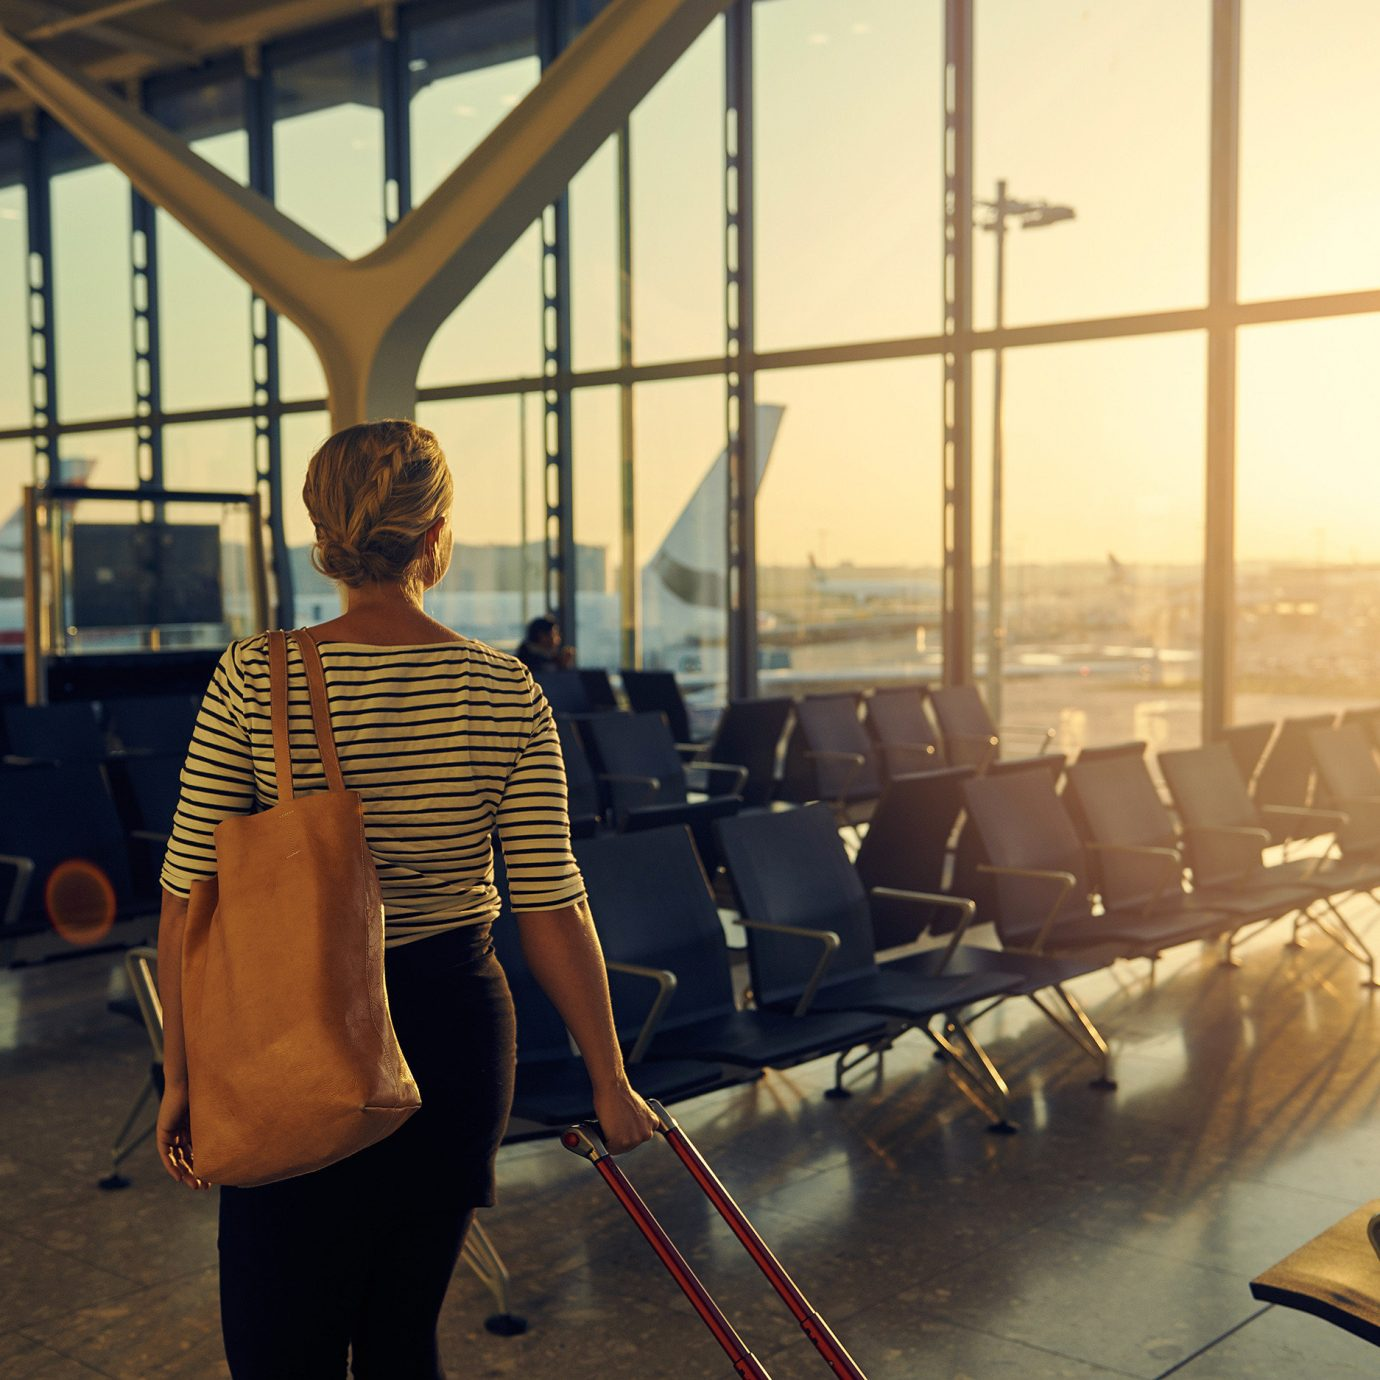 airport terminal Flights News person standing sunlight fun girl angle